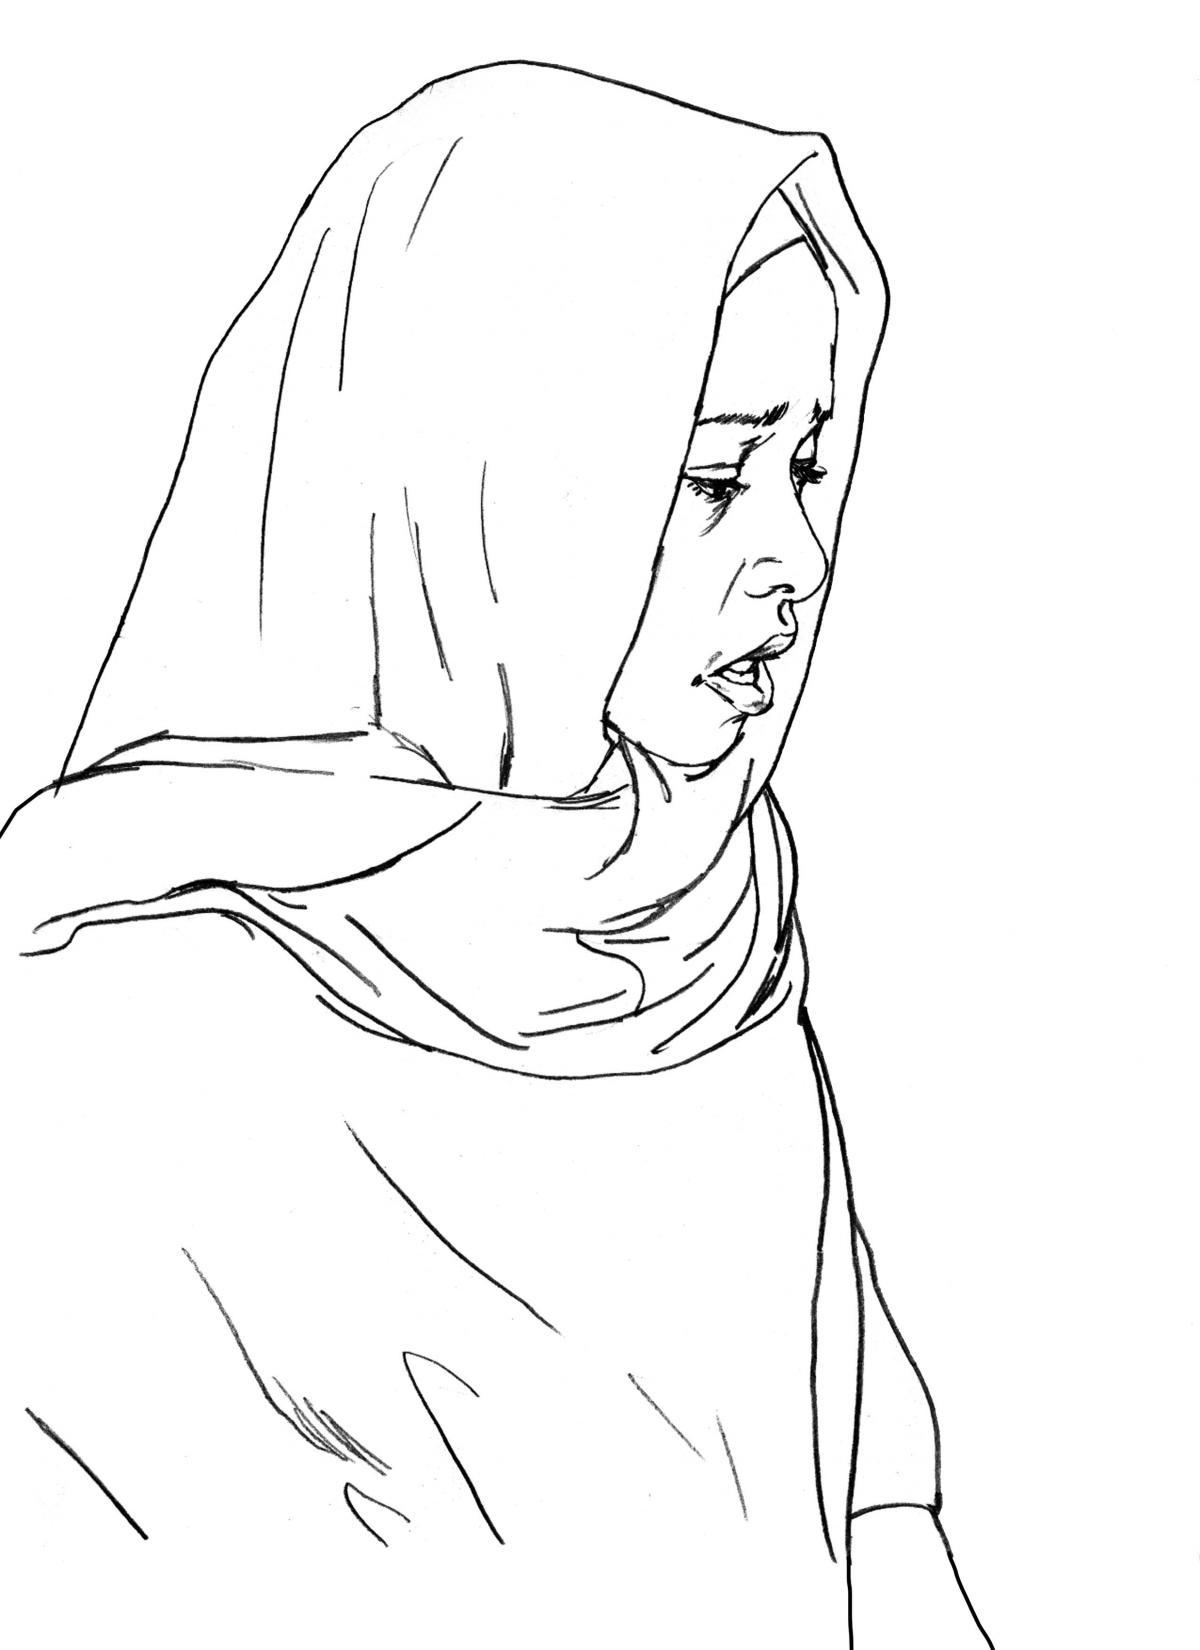 Maternal health - When to visit the health clinic - pregnancy - 10B - Kenya Dadaab